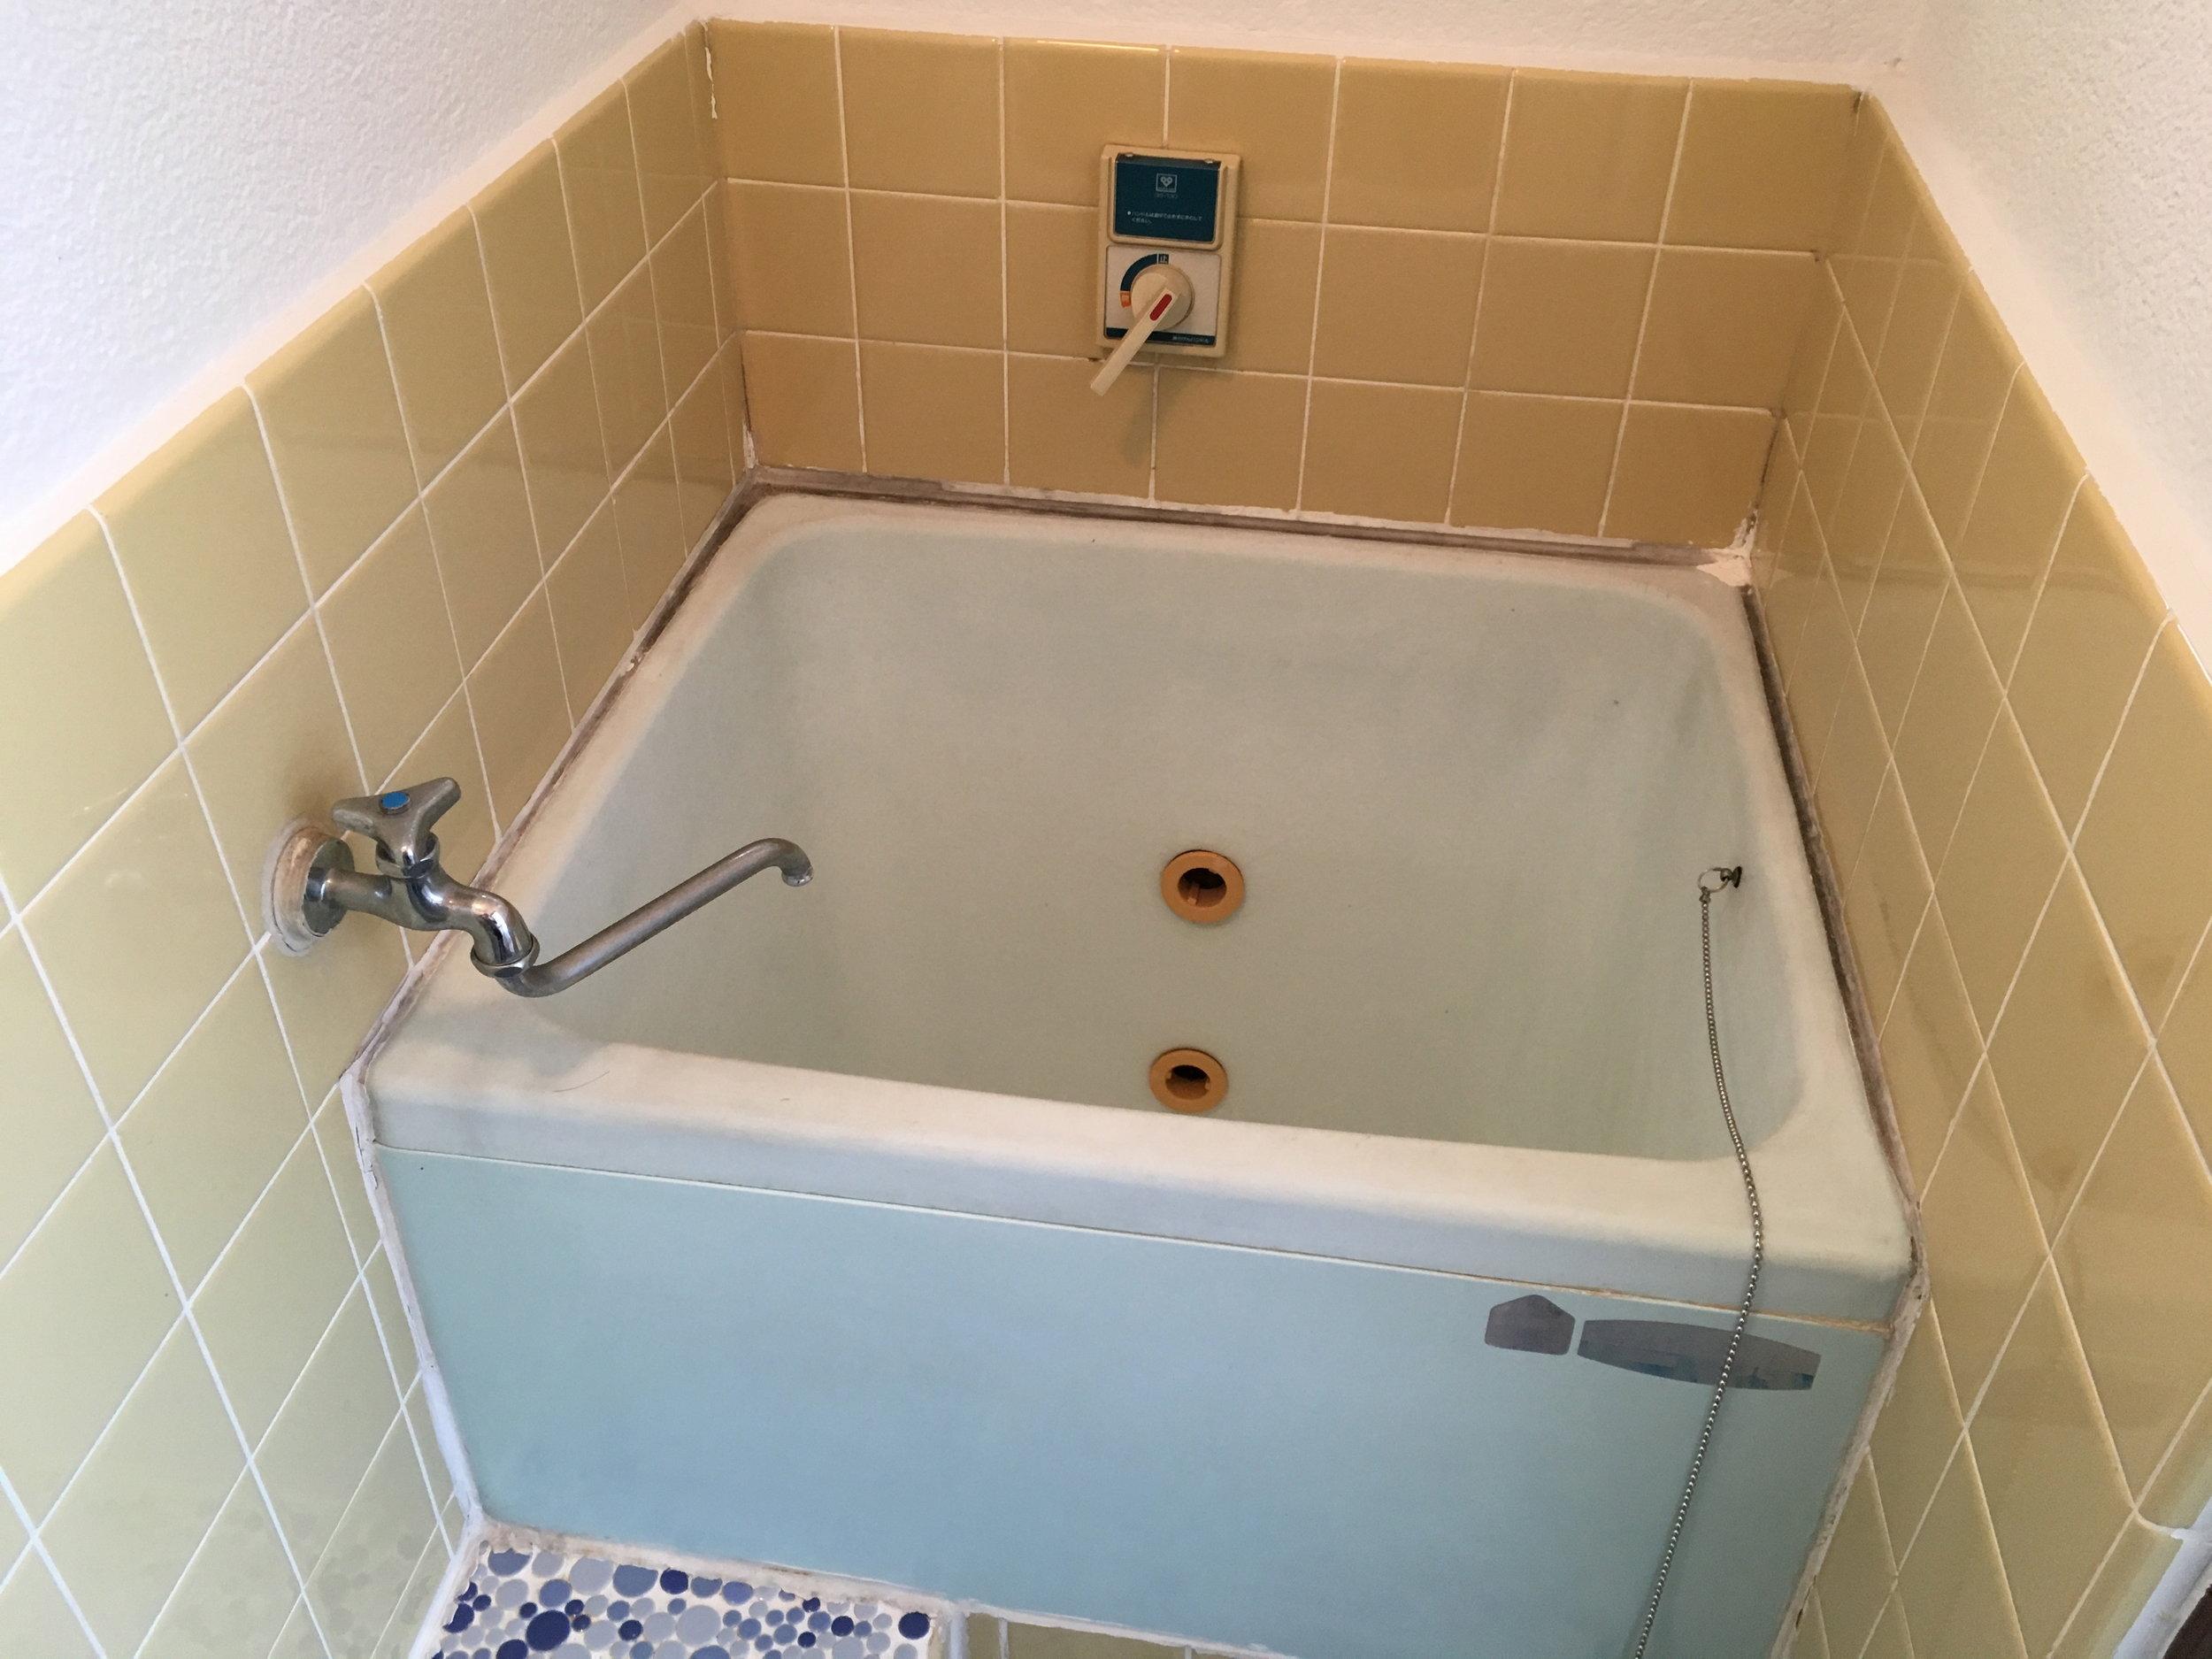 I'm not brave enough to take bath here...